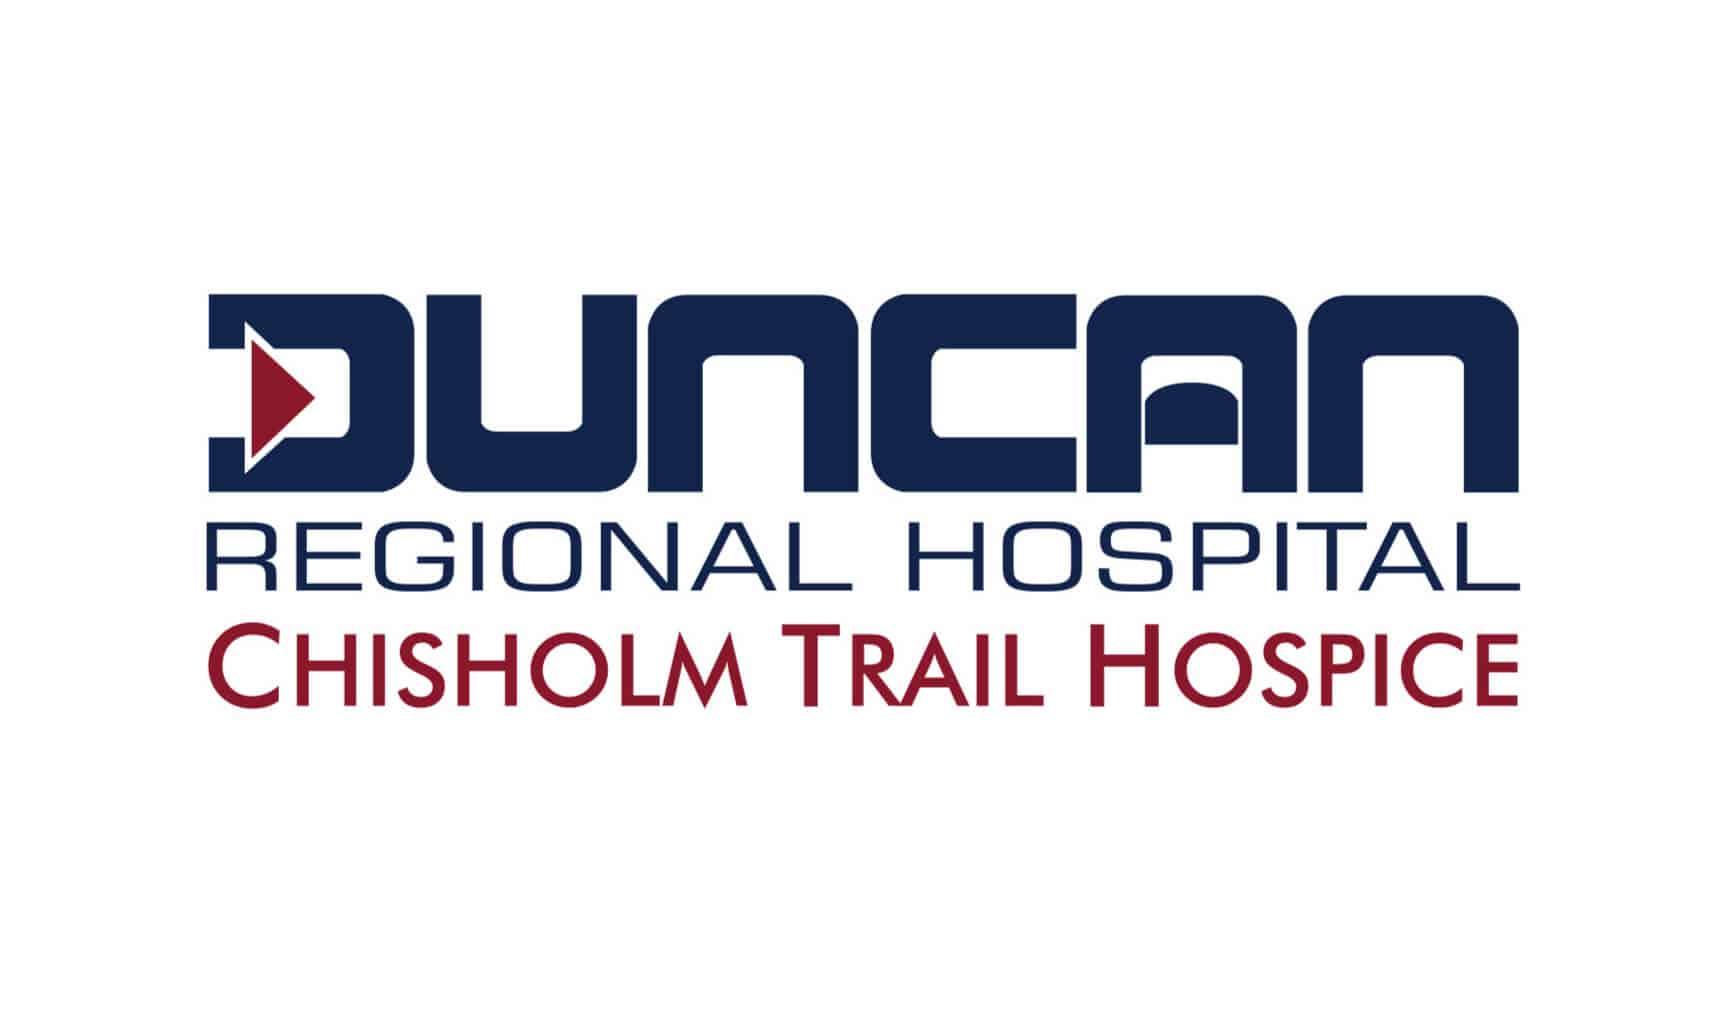 Logo of Chisholm Trail Hospice